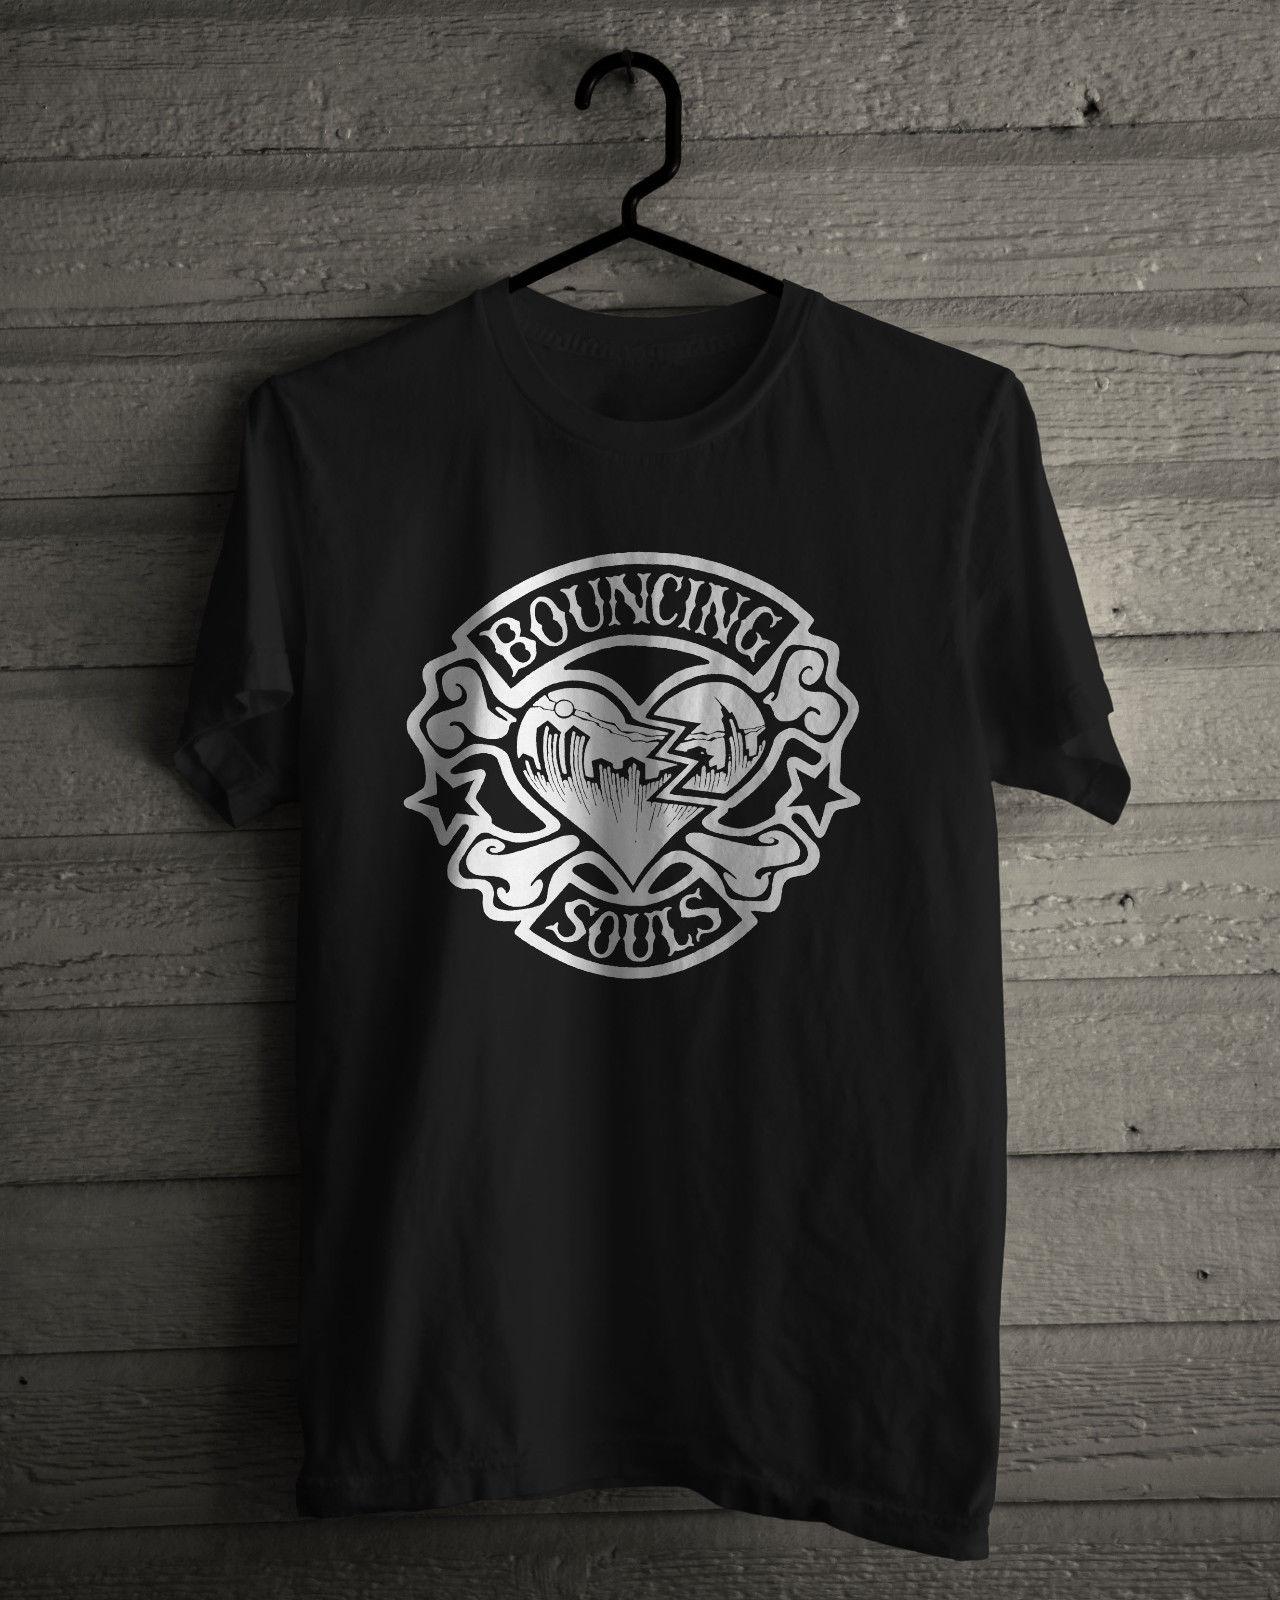 Camiseta The Bouncing Souls, nueva camiseta negra de banda Punk Rock americana de Nuevo Brunswick 2017, camiseta Casual de manga corta